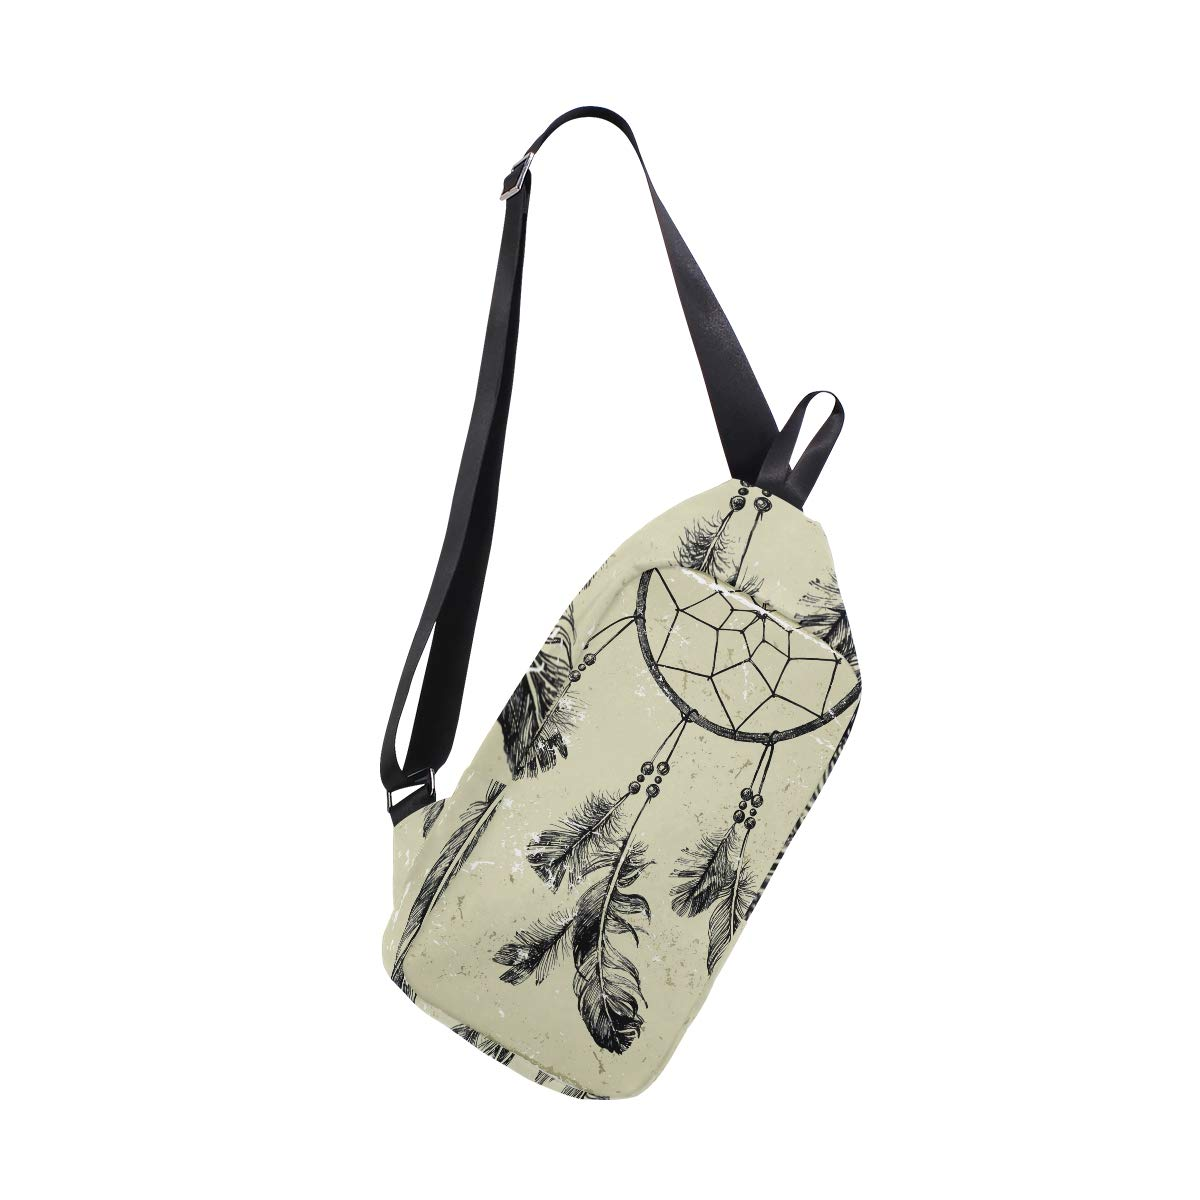 Unisex Messenger Bag Dream Catchers Feather Shoulder Chest Cross Body Backpack Bag